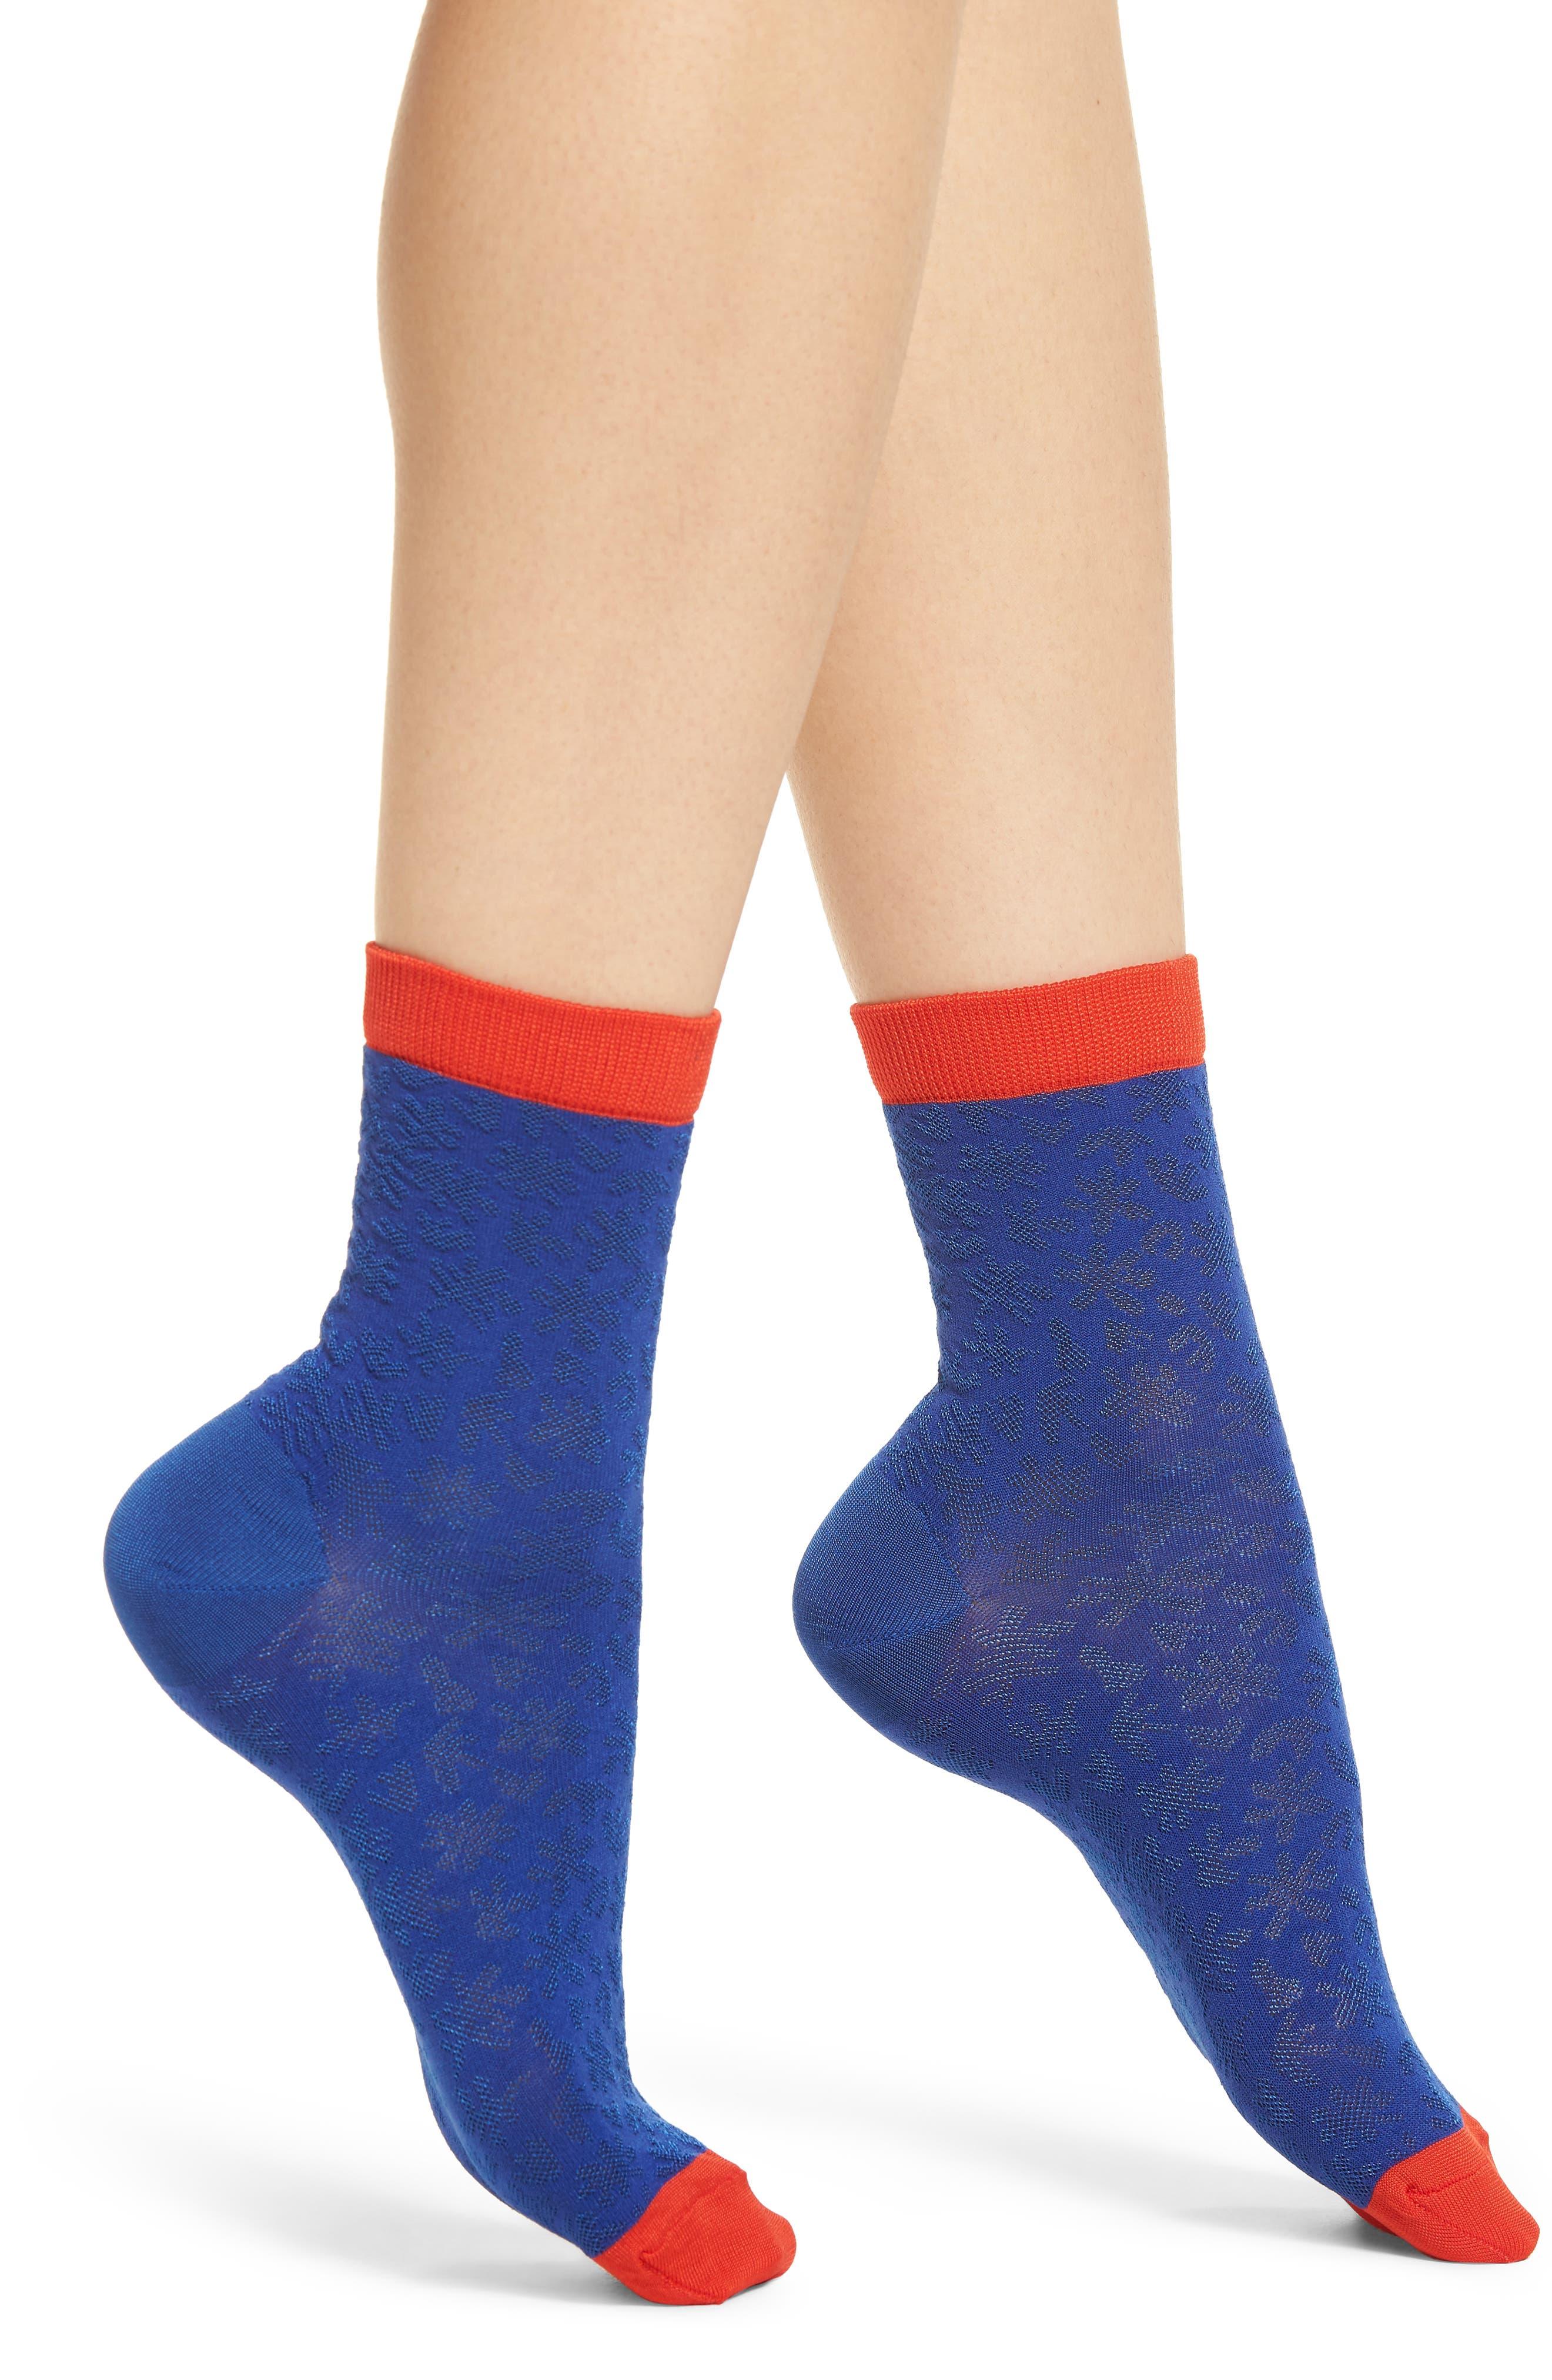 Main Image - Hysteria by Happy Socks Lotta Ankle Socks